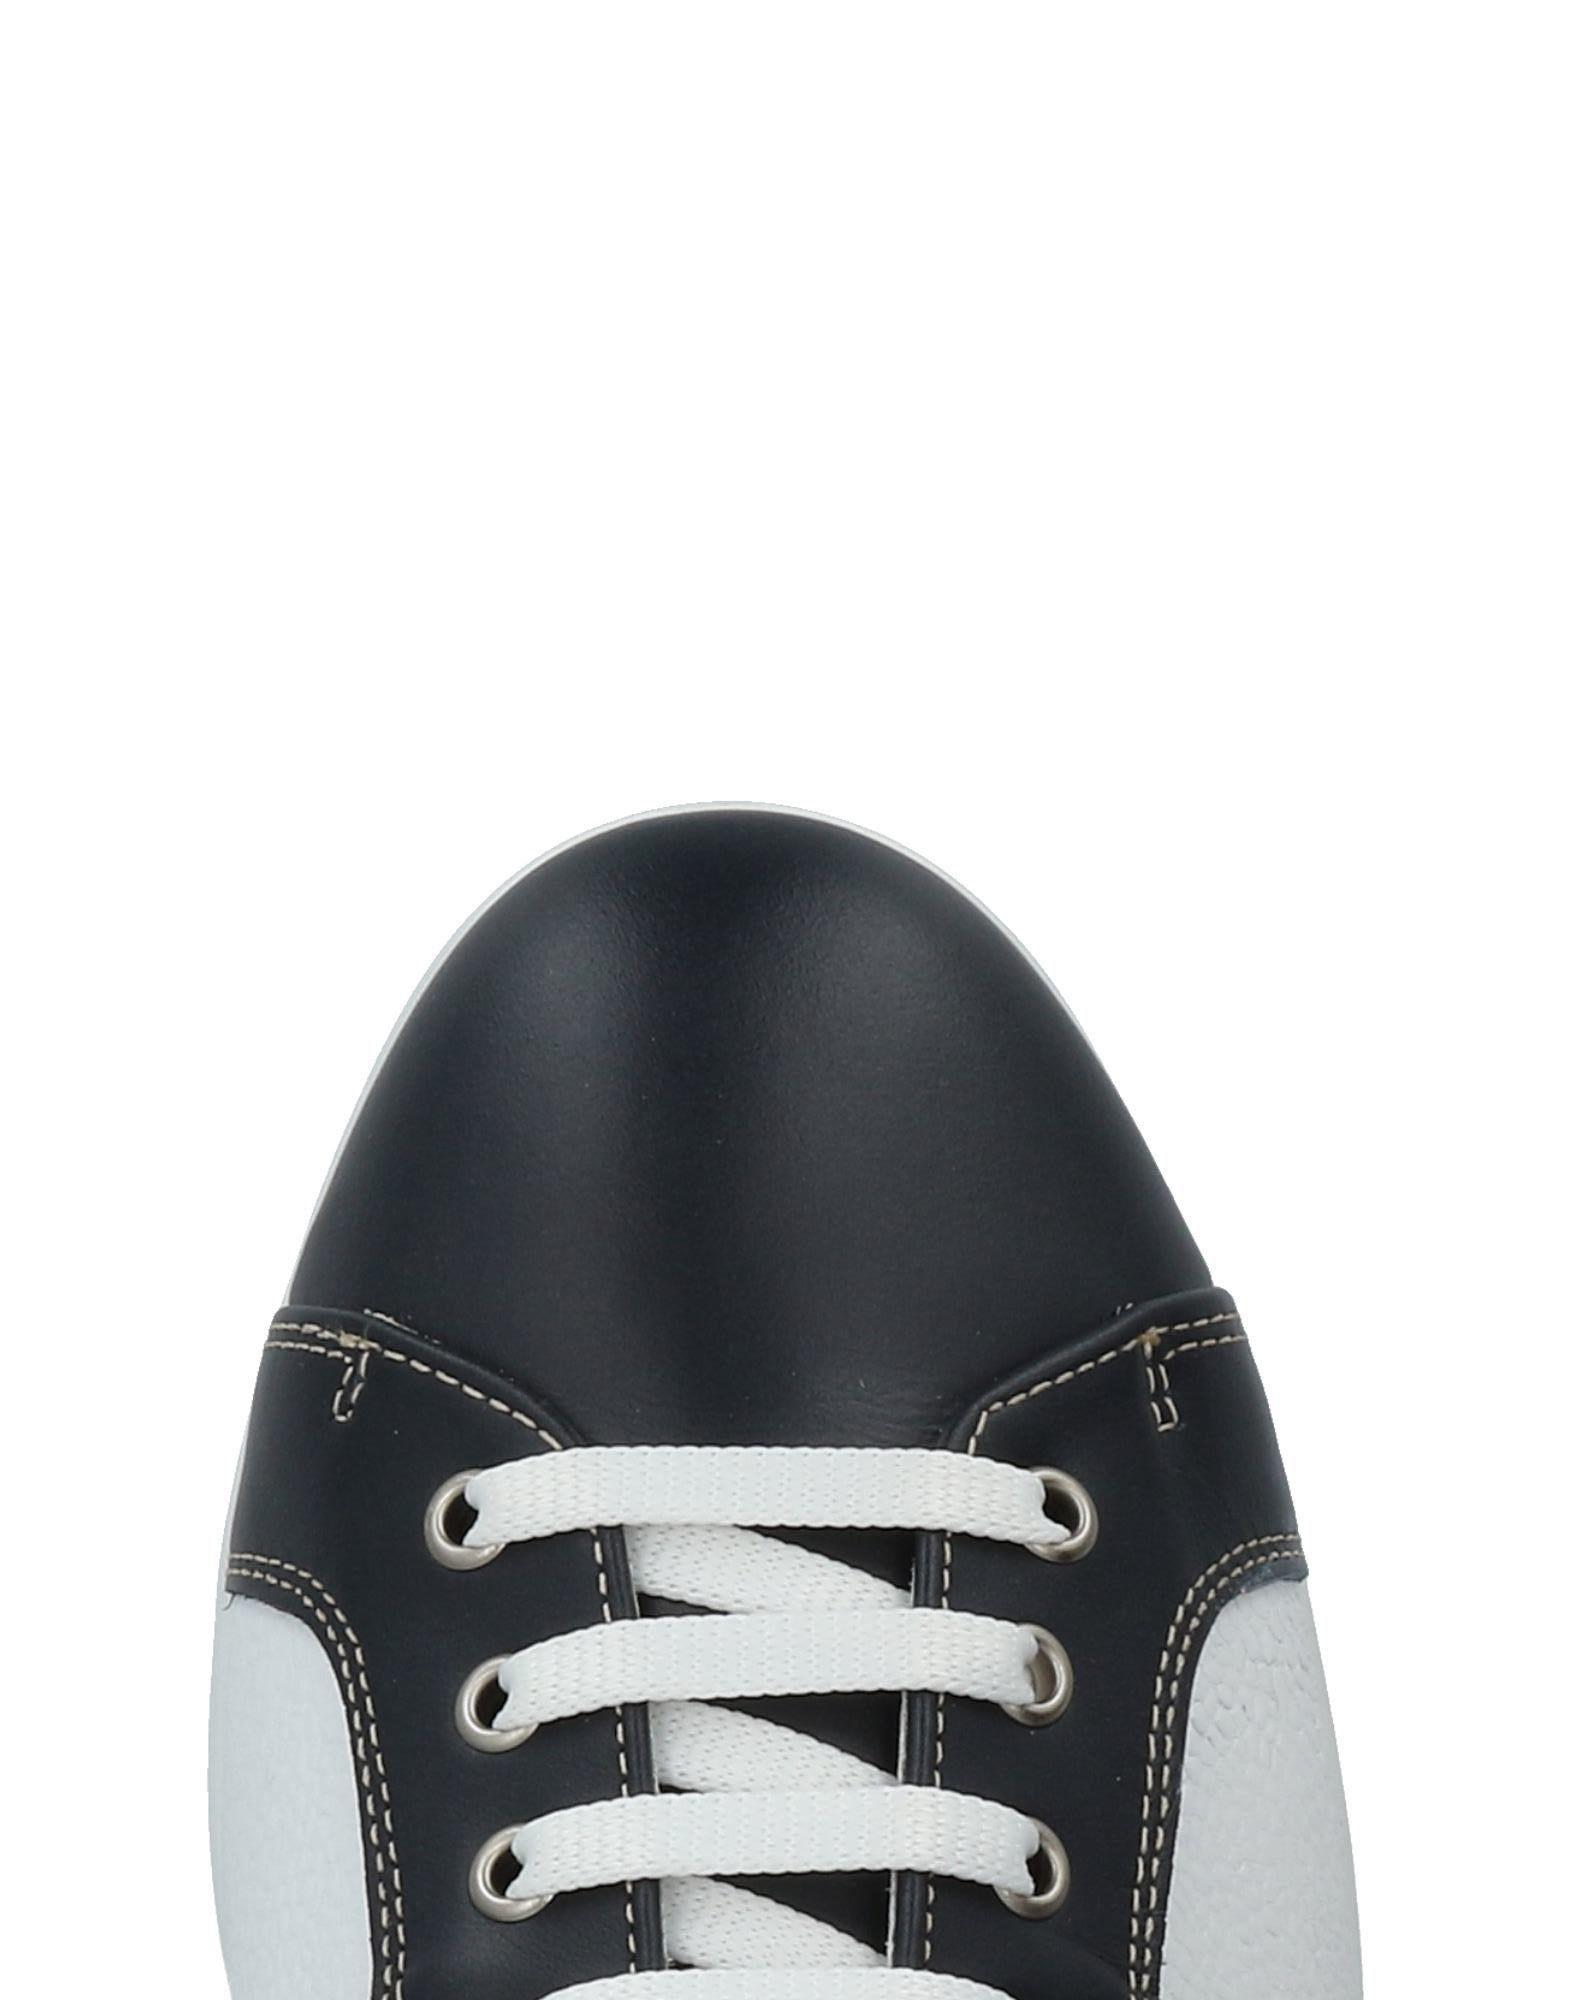 Gianfranco Lattanzi Sneakers - Men Gianfranco Lattanzi Lattanzi Lattanzi Sneakers online on  United Kingdom - 11414239RJ 22e2a5